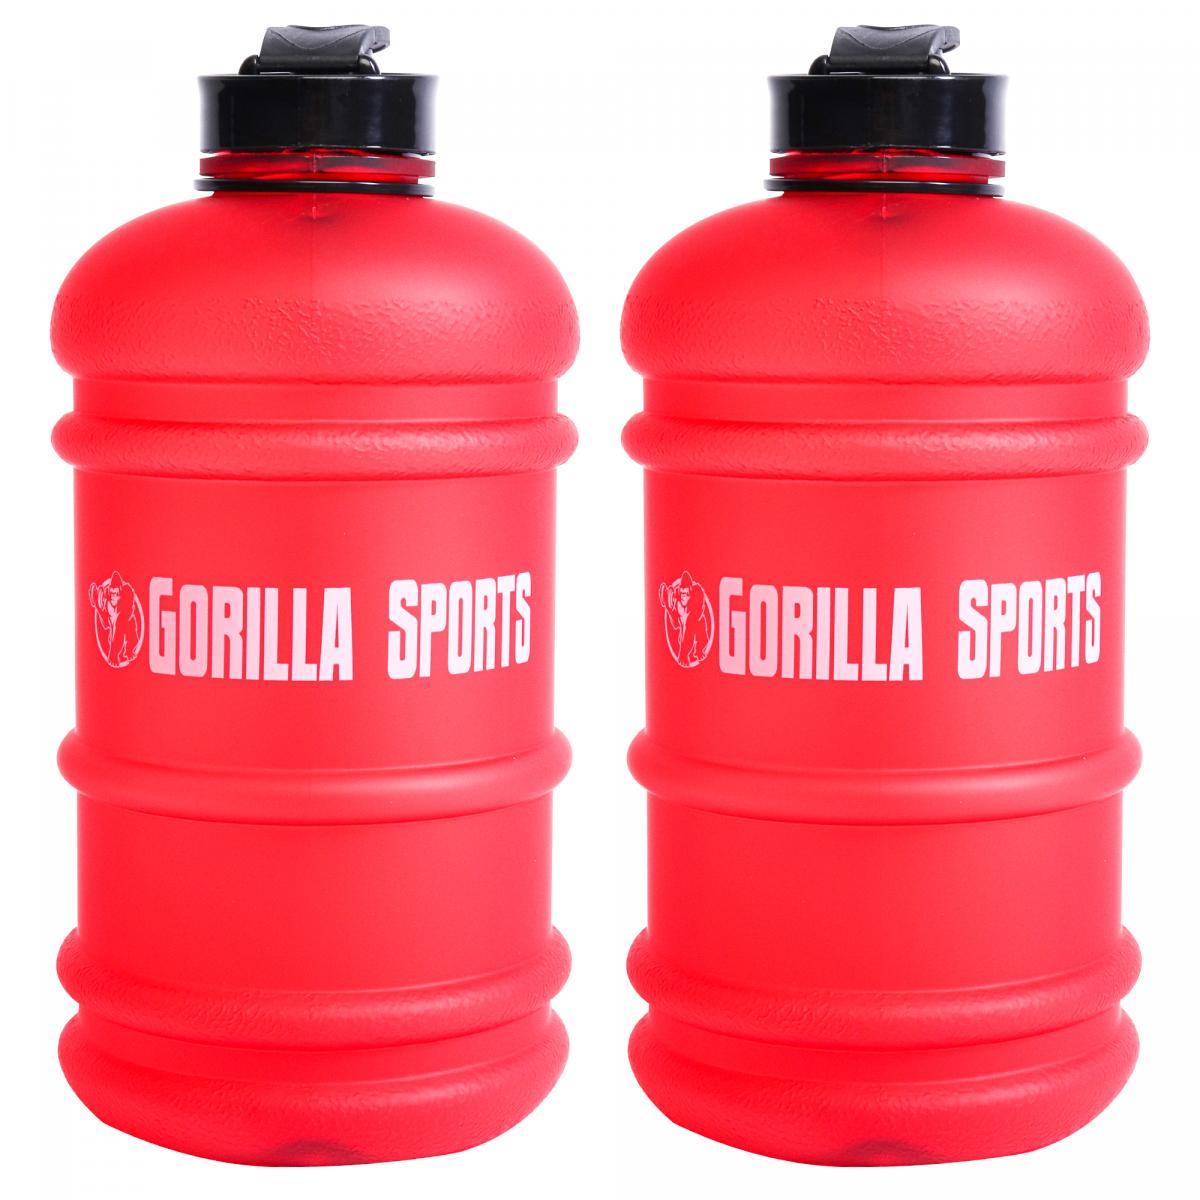 Gorilla Sports 2er Set Trinkflasche Gallone 2,2 L Rot 101171-00038-0137